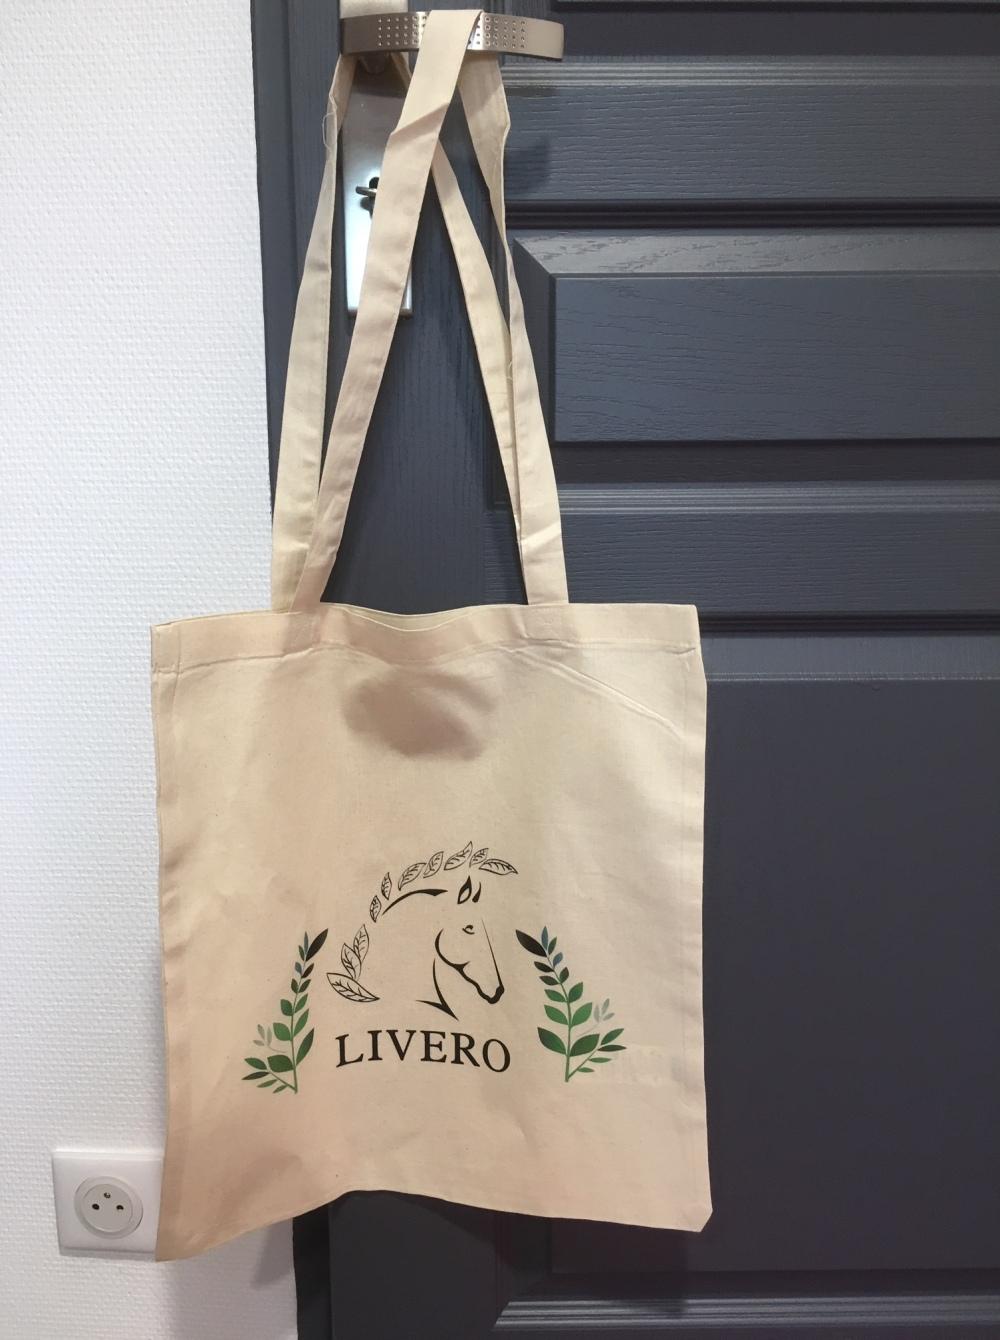 sac coton livero